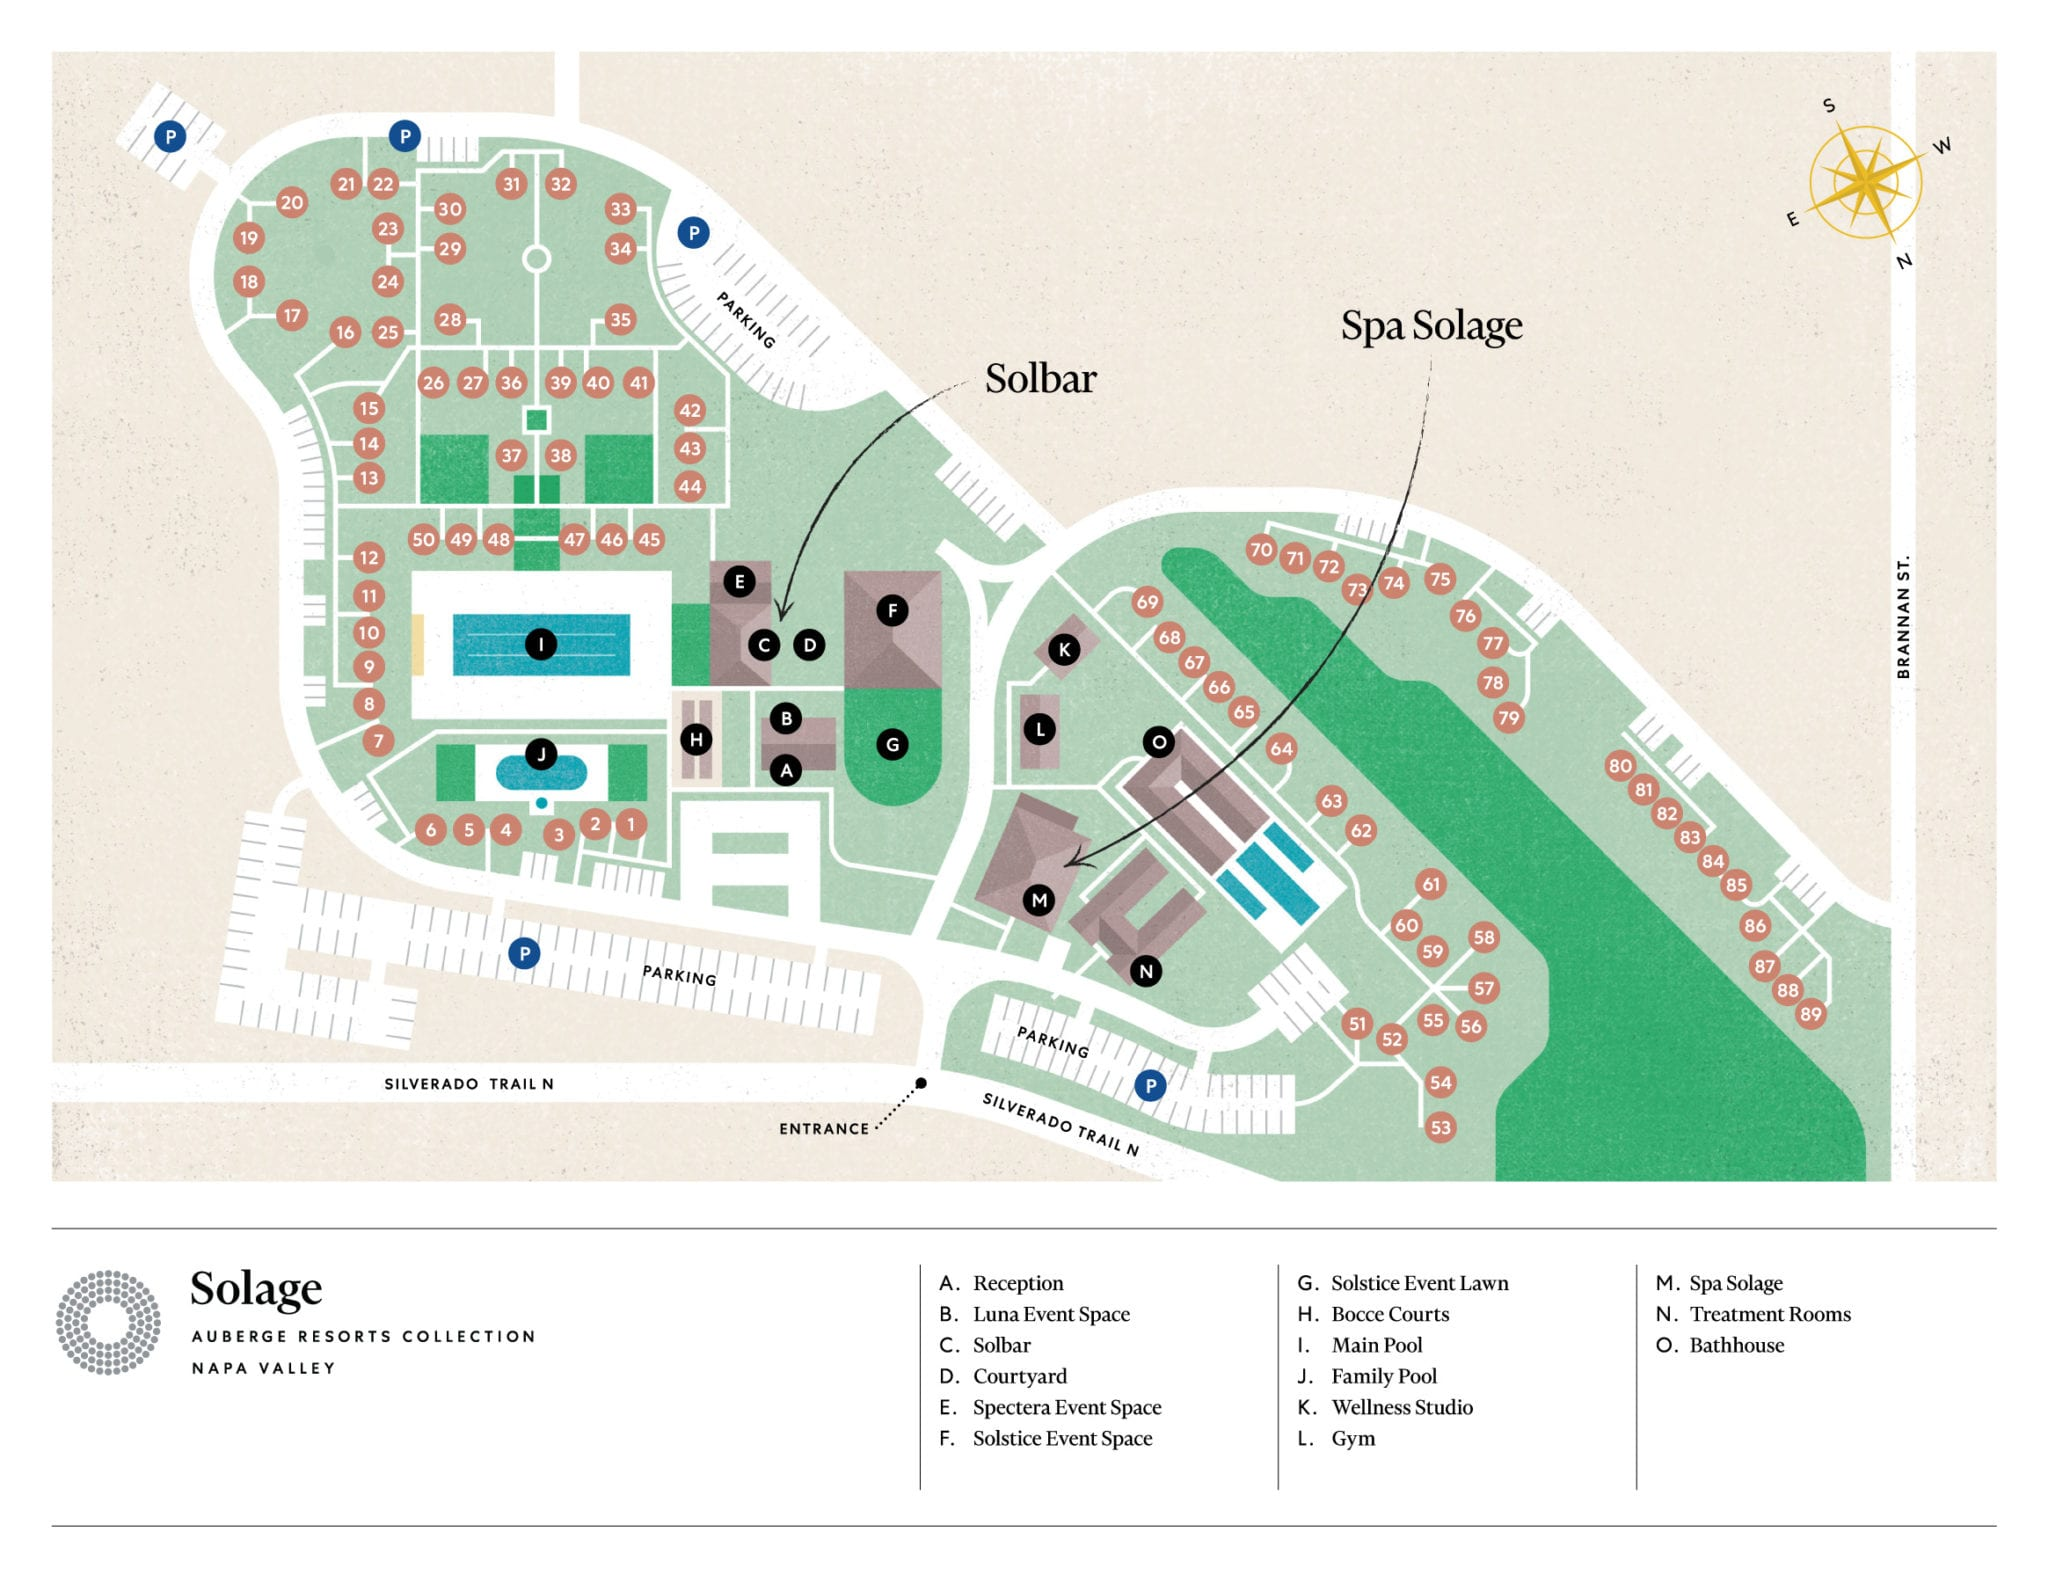 Solage, an Auberge Resort & Spa in Calistoga, CA